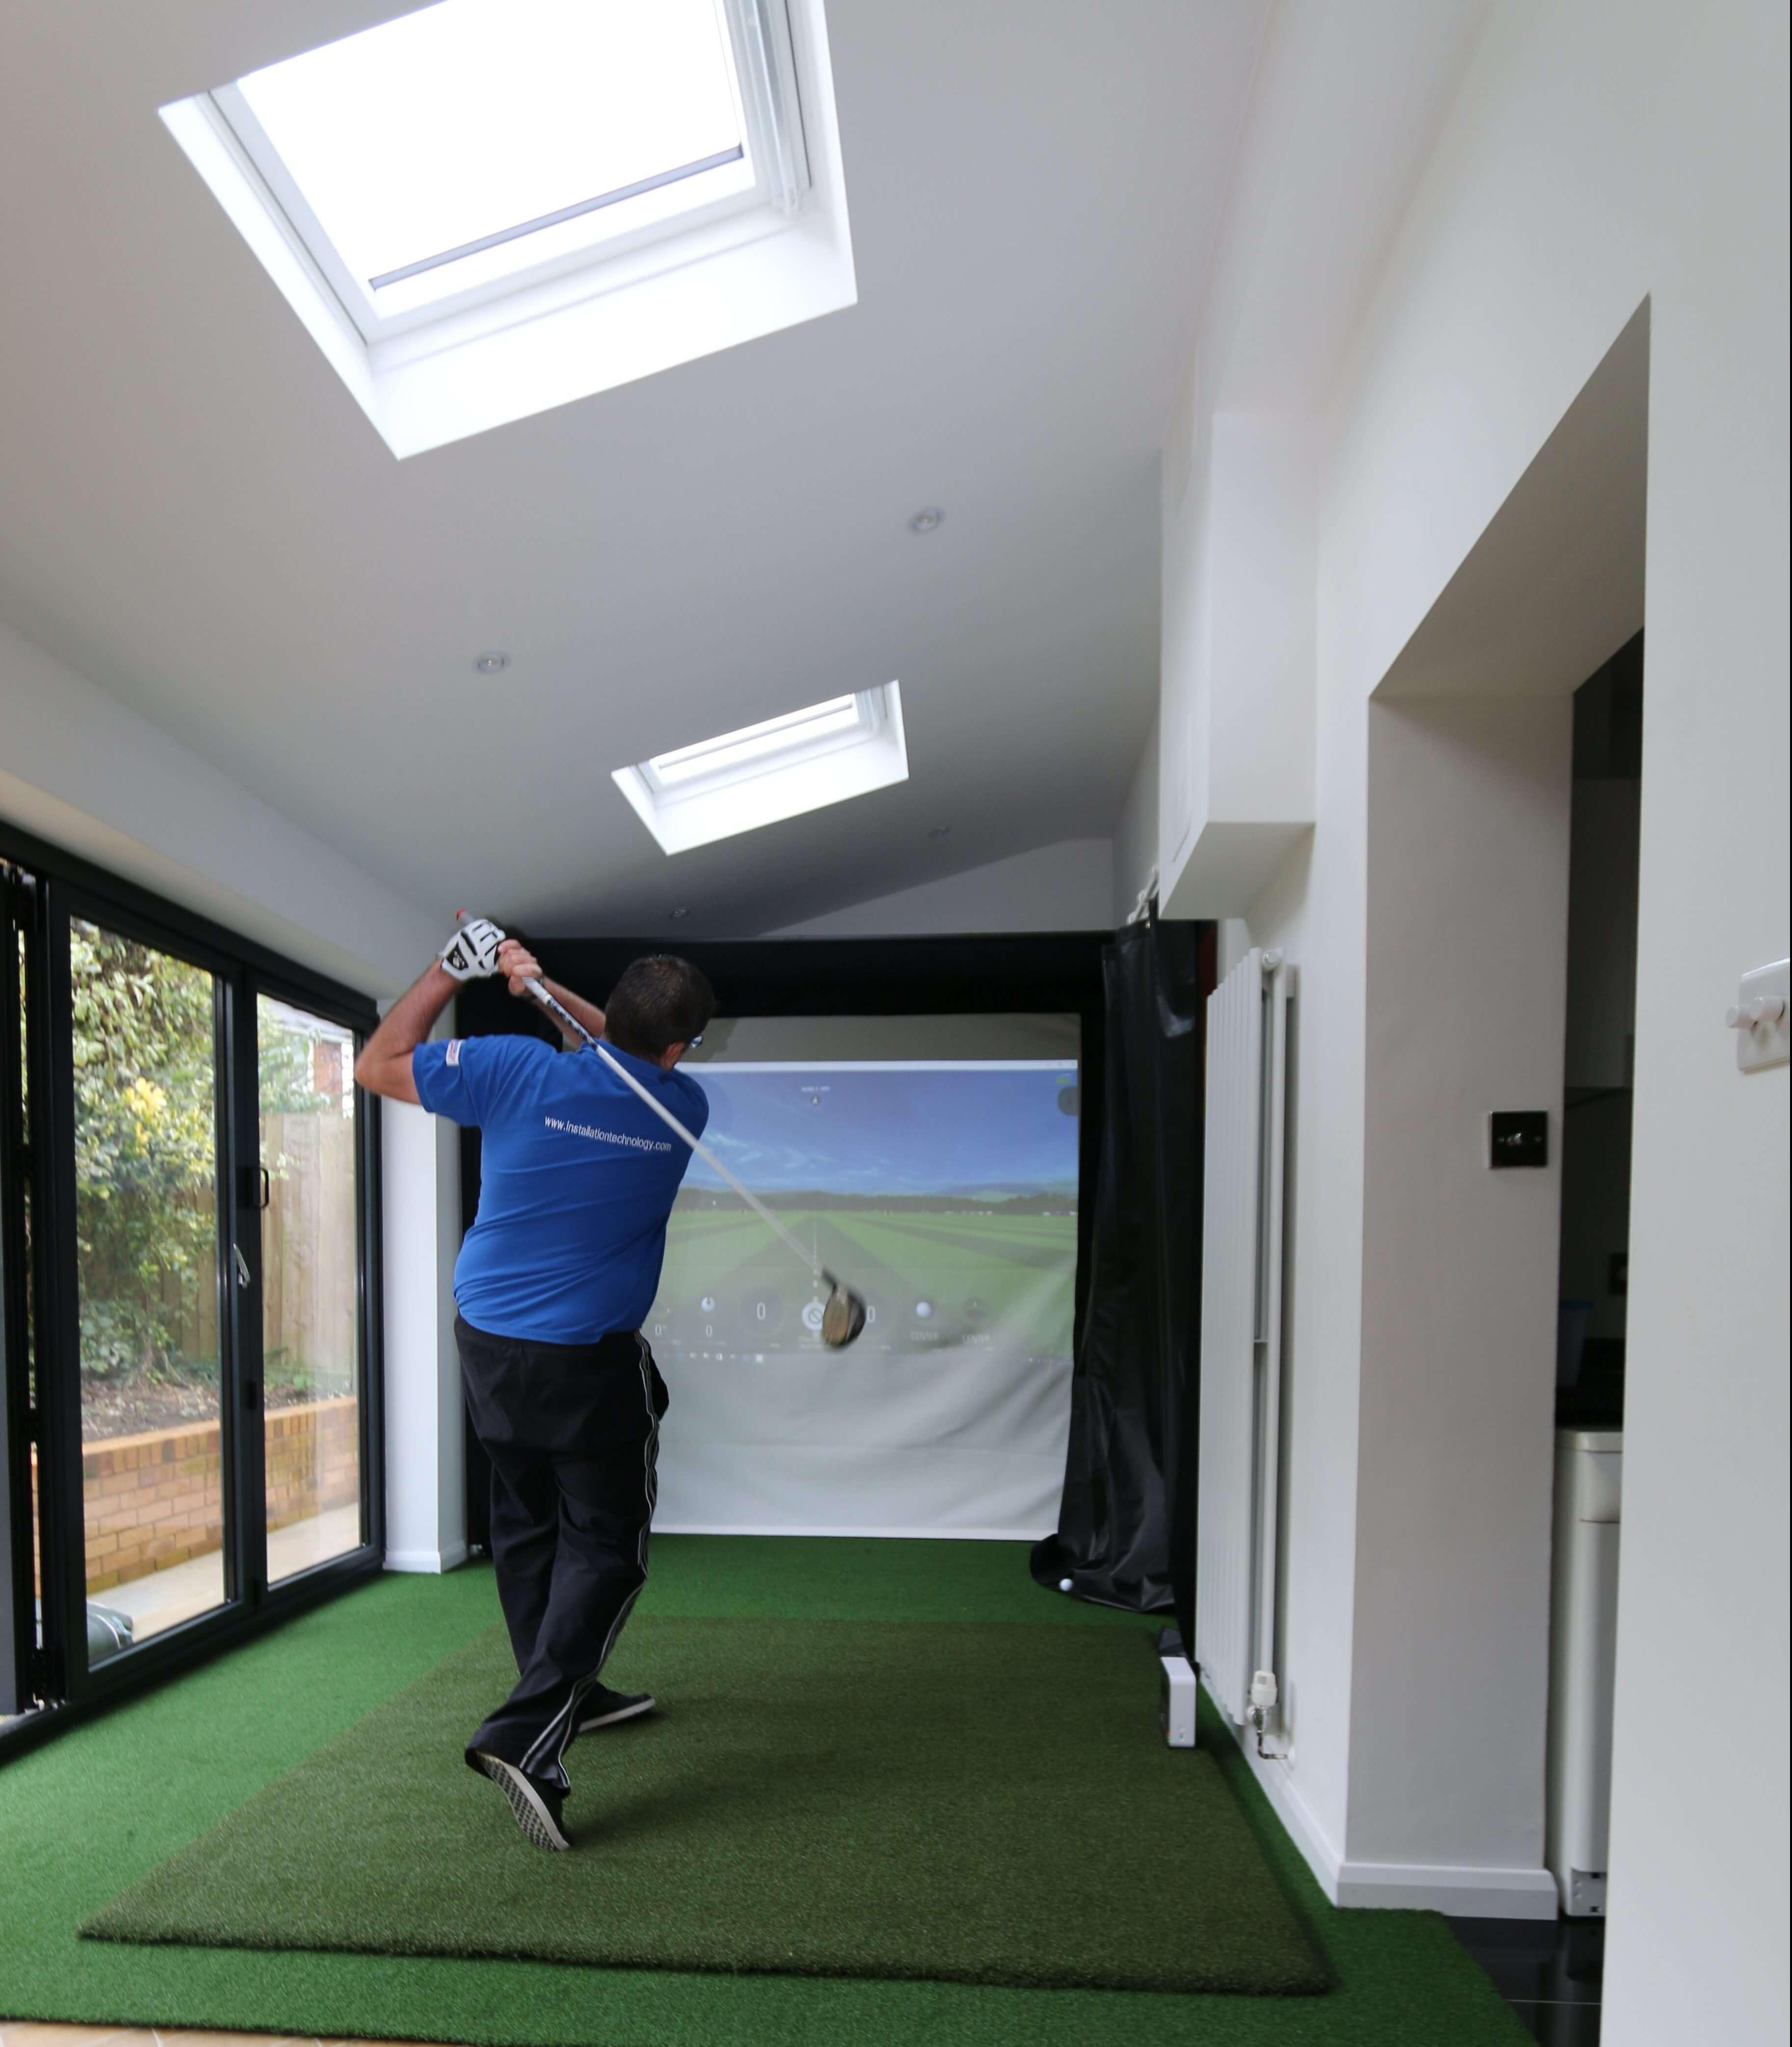 golf simulator business plan